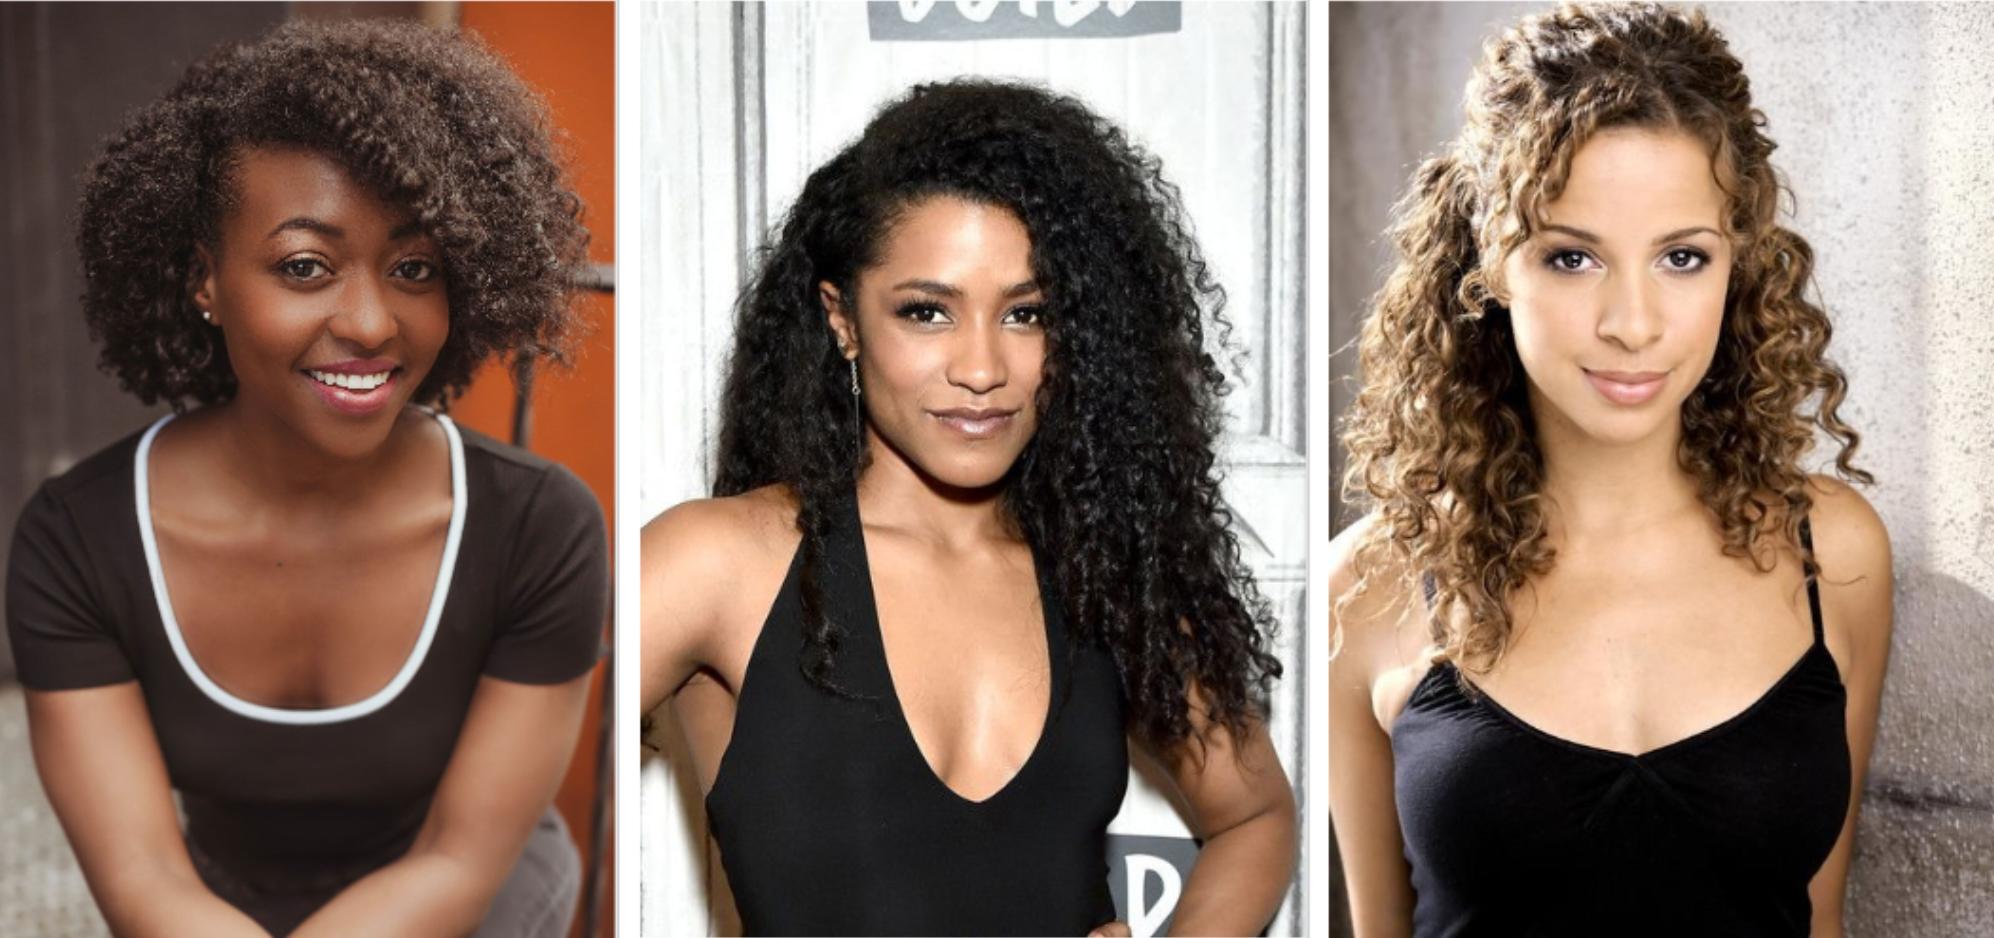 Aisha Jackson, Taylor Iman Jones, Lexi Lawson and More Set For 54 CELEBRATES WHITNEY HOUSTON